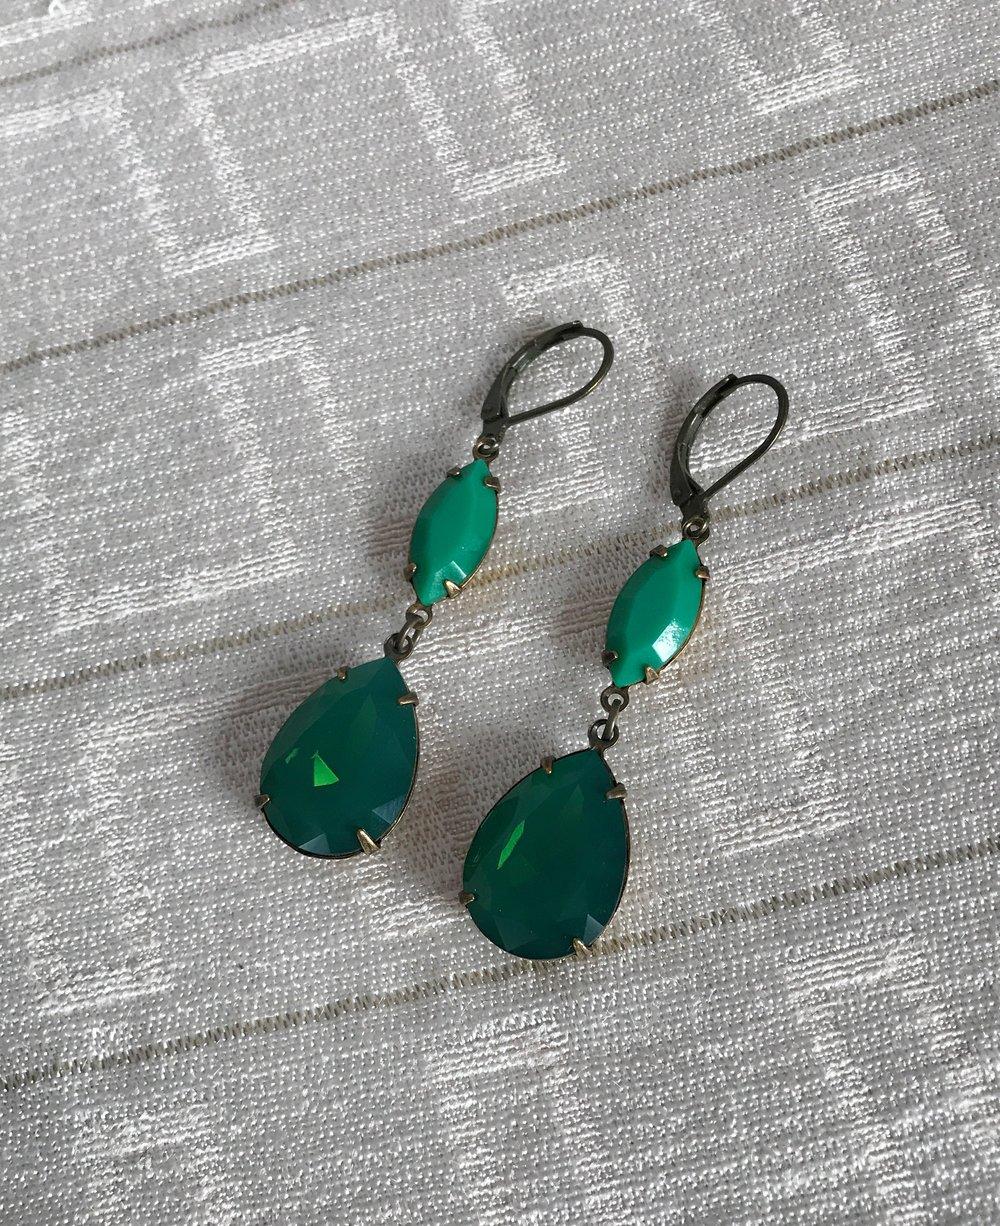 918e70e9c1c02 Vintage Swarovski Crystal Earrings - Palace Green Opal and Apple Green